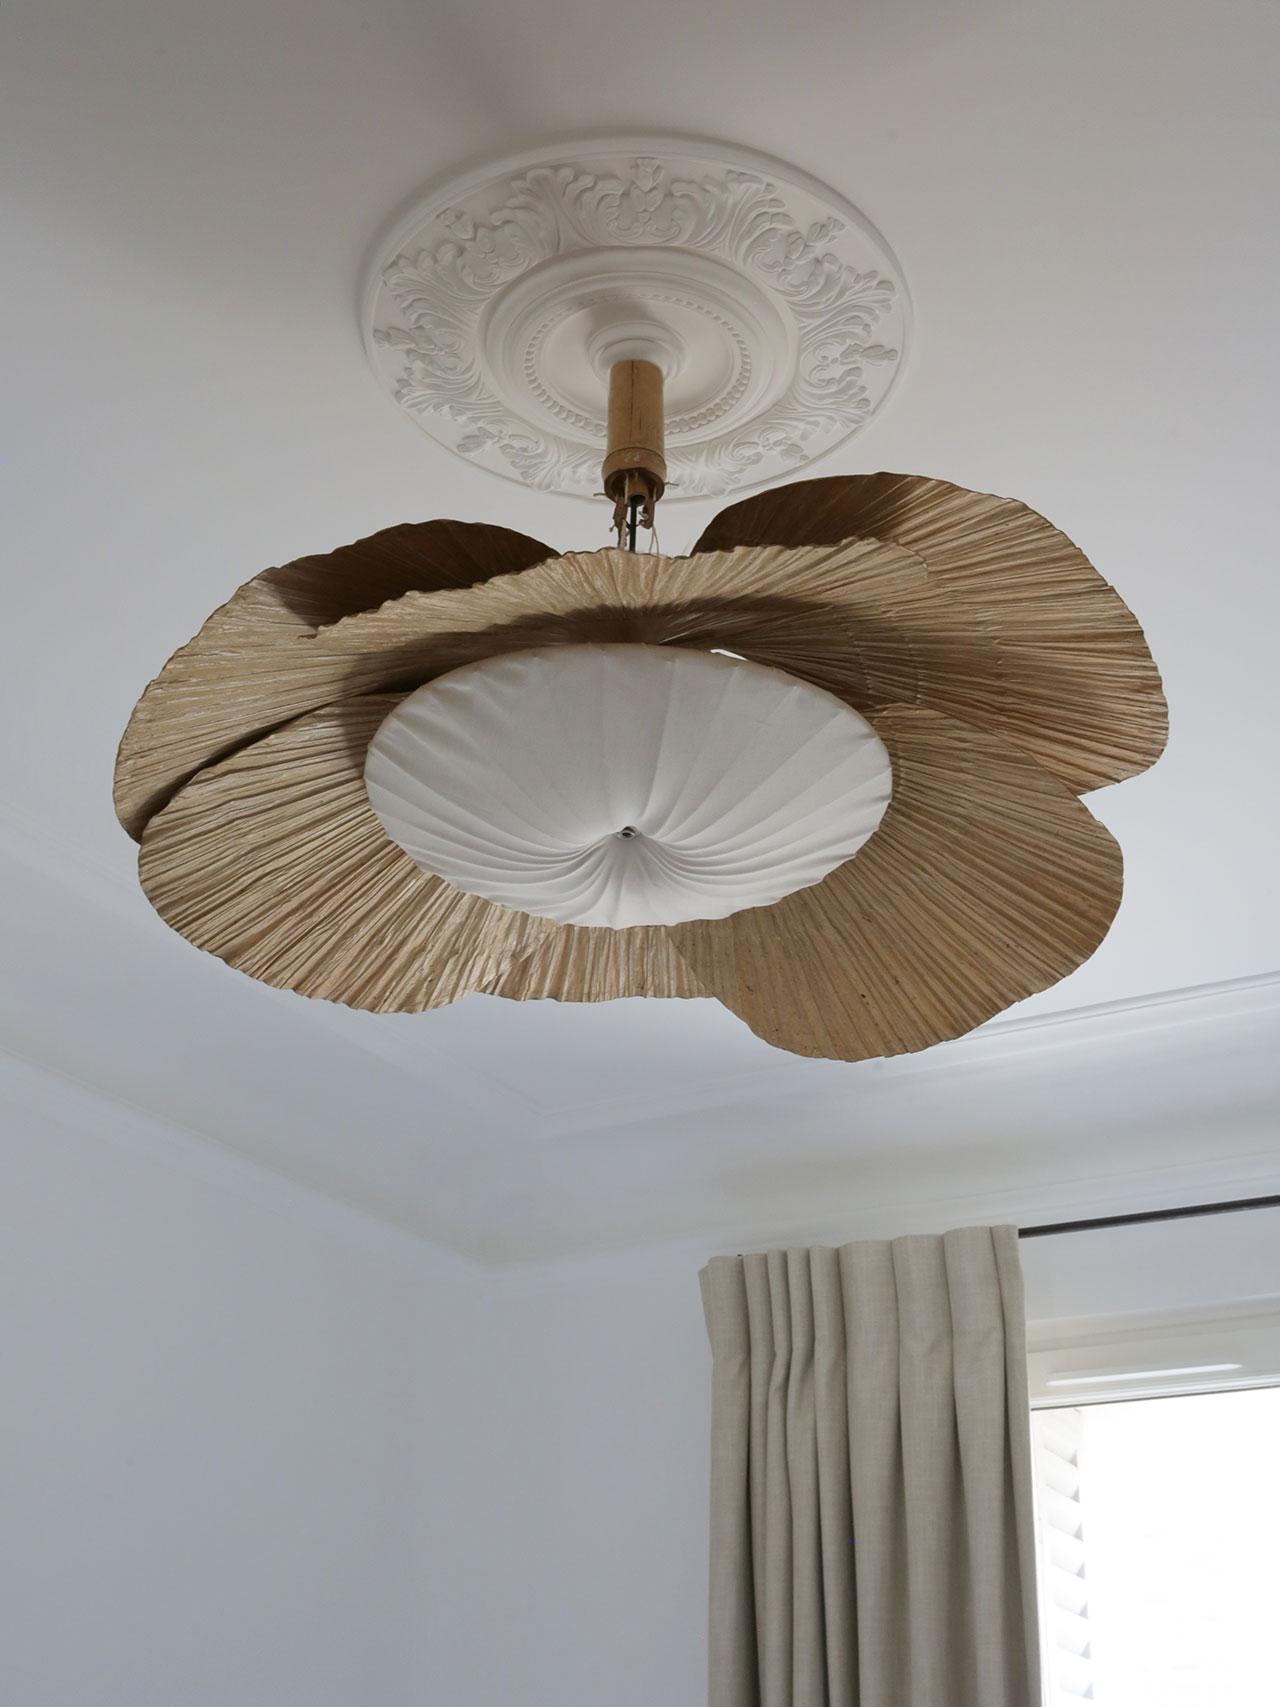 Uchiwa ceiling lightin rattan andrice paper by Ingo Maurer, 1970. Photography by Damien de Medeiros.